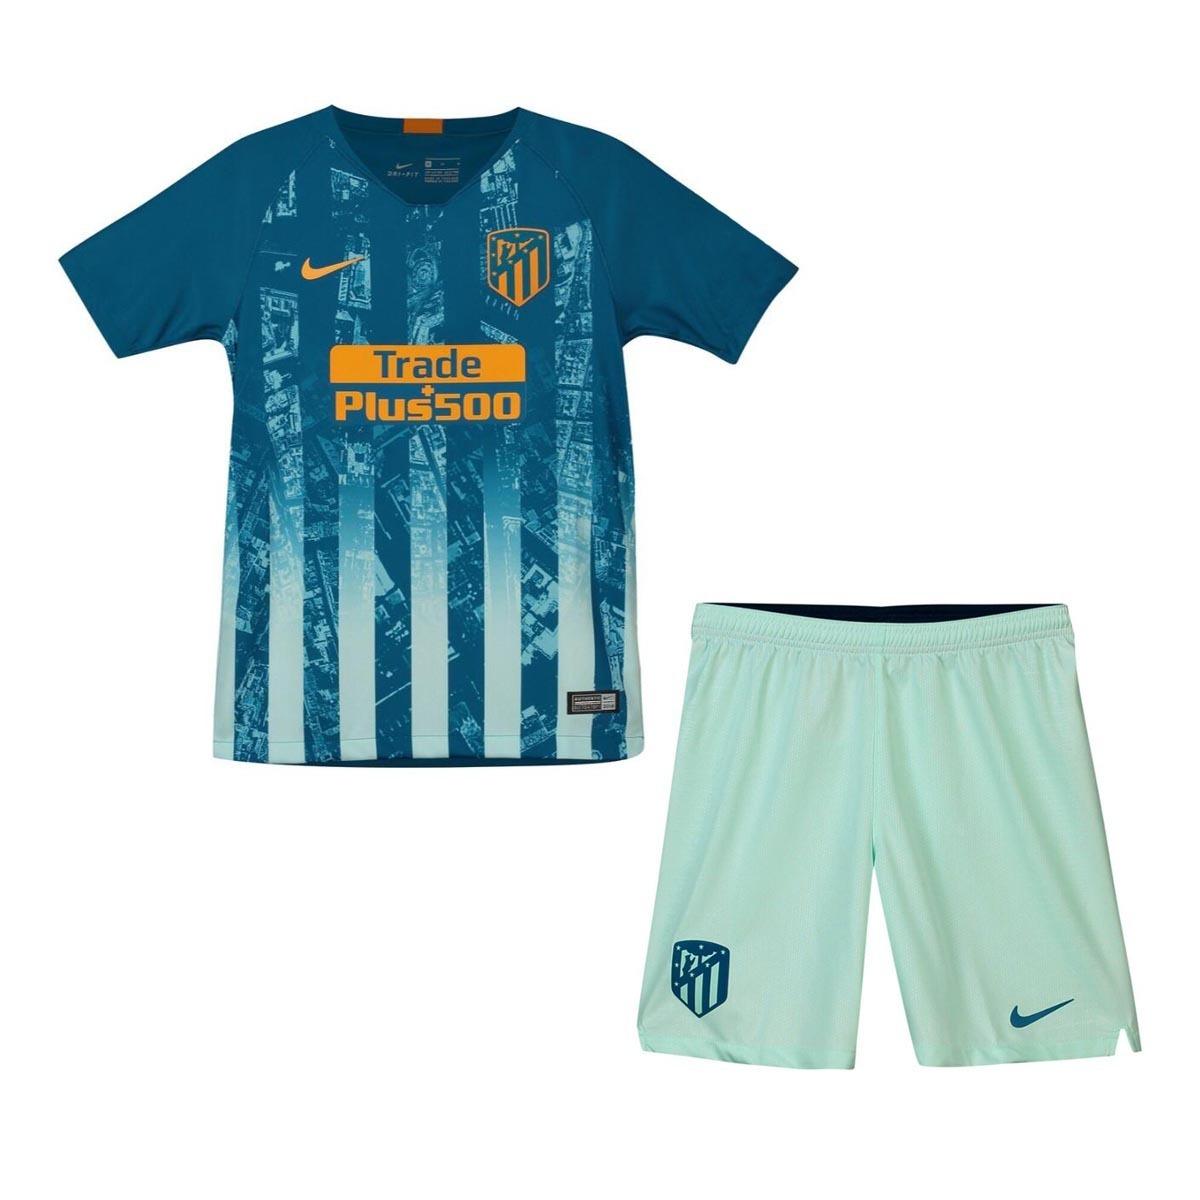 uniforme infantil camisa shorts futebol atletico madrid 2018. Carregando  zoom. 2c449dd2389d9